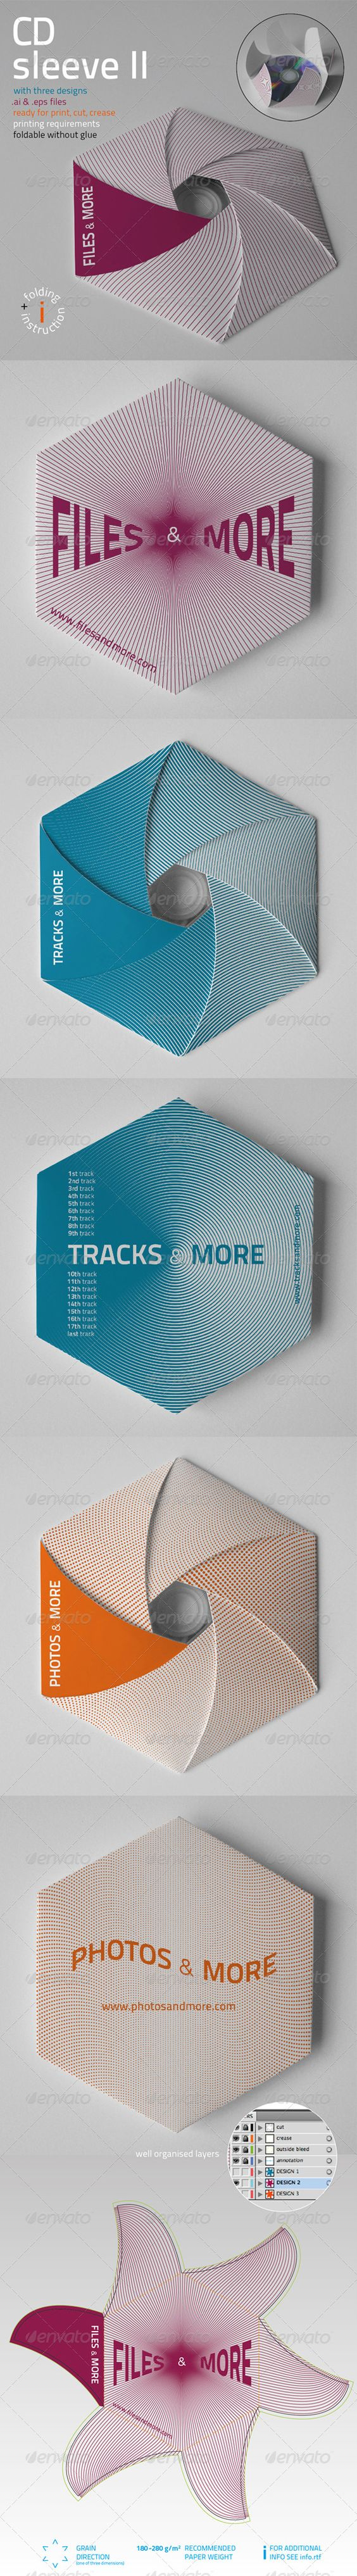 CD Sleeve v2 - GraphicRiver Item for Sale